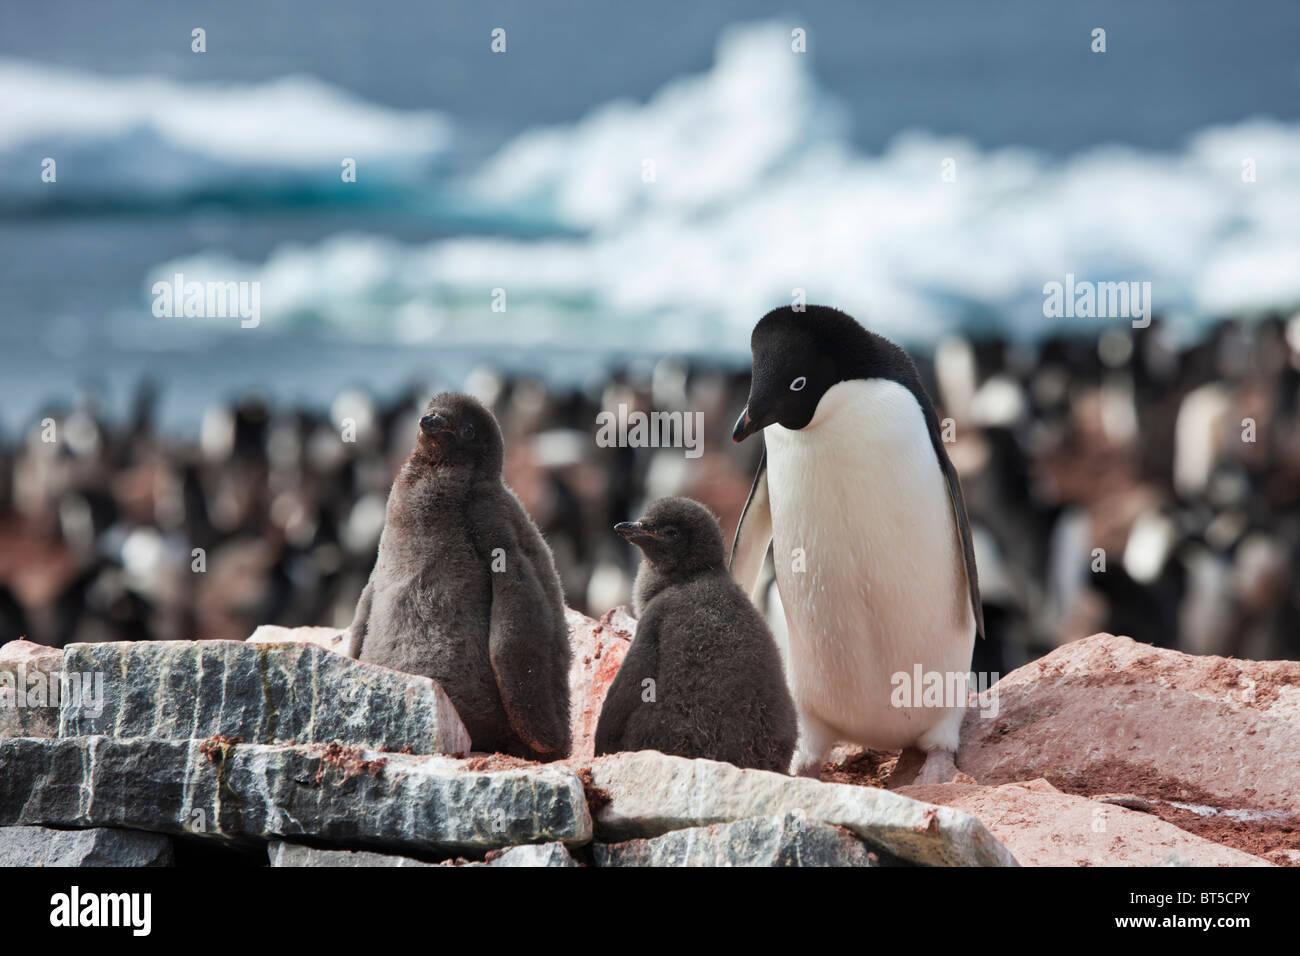 Adelie penguin colony on Paulet Island, Antarctic Peninsula. - Stock Image